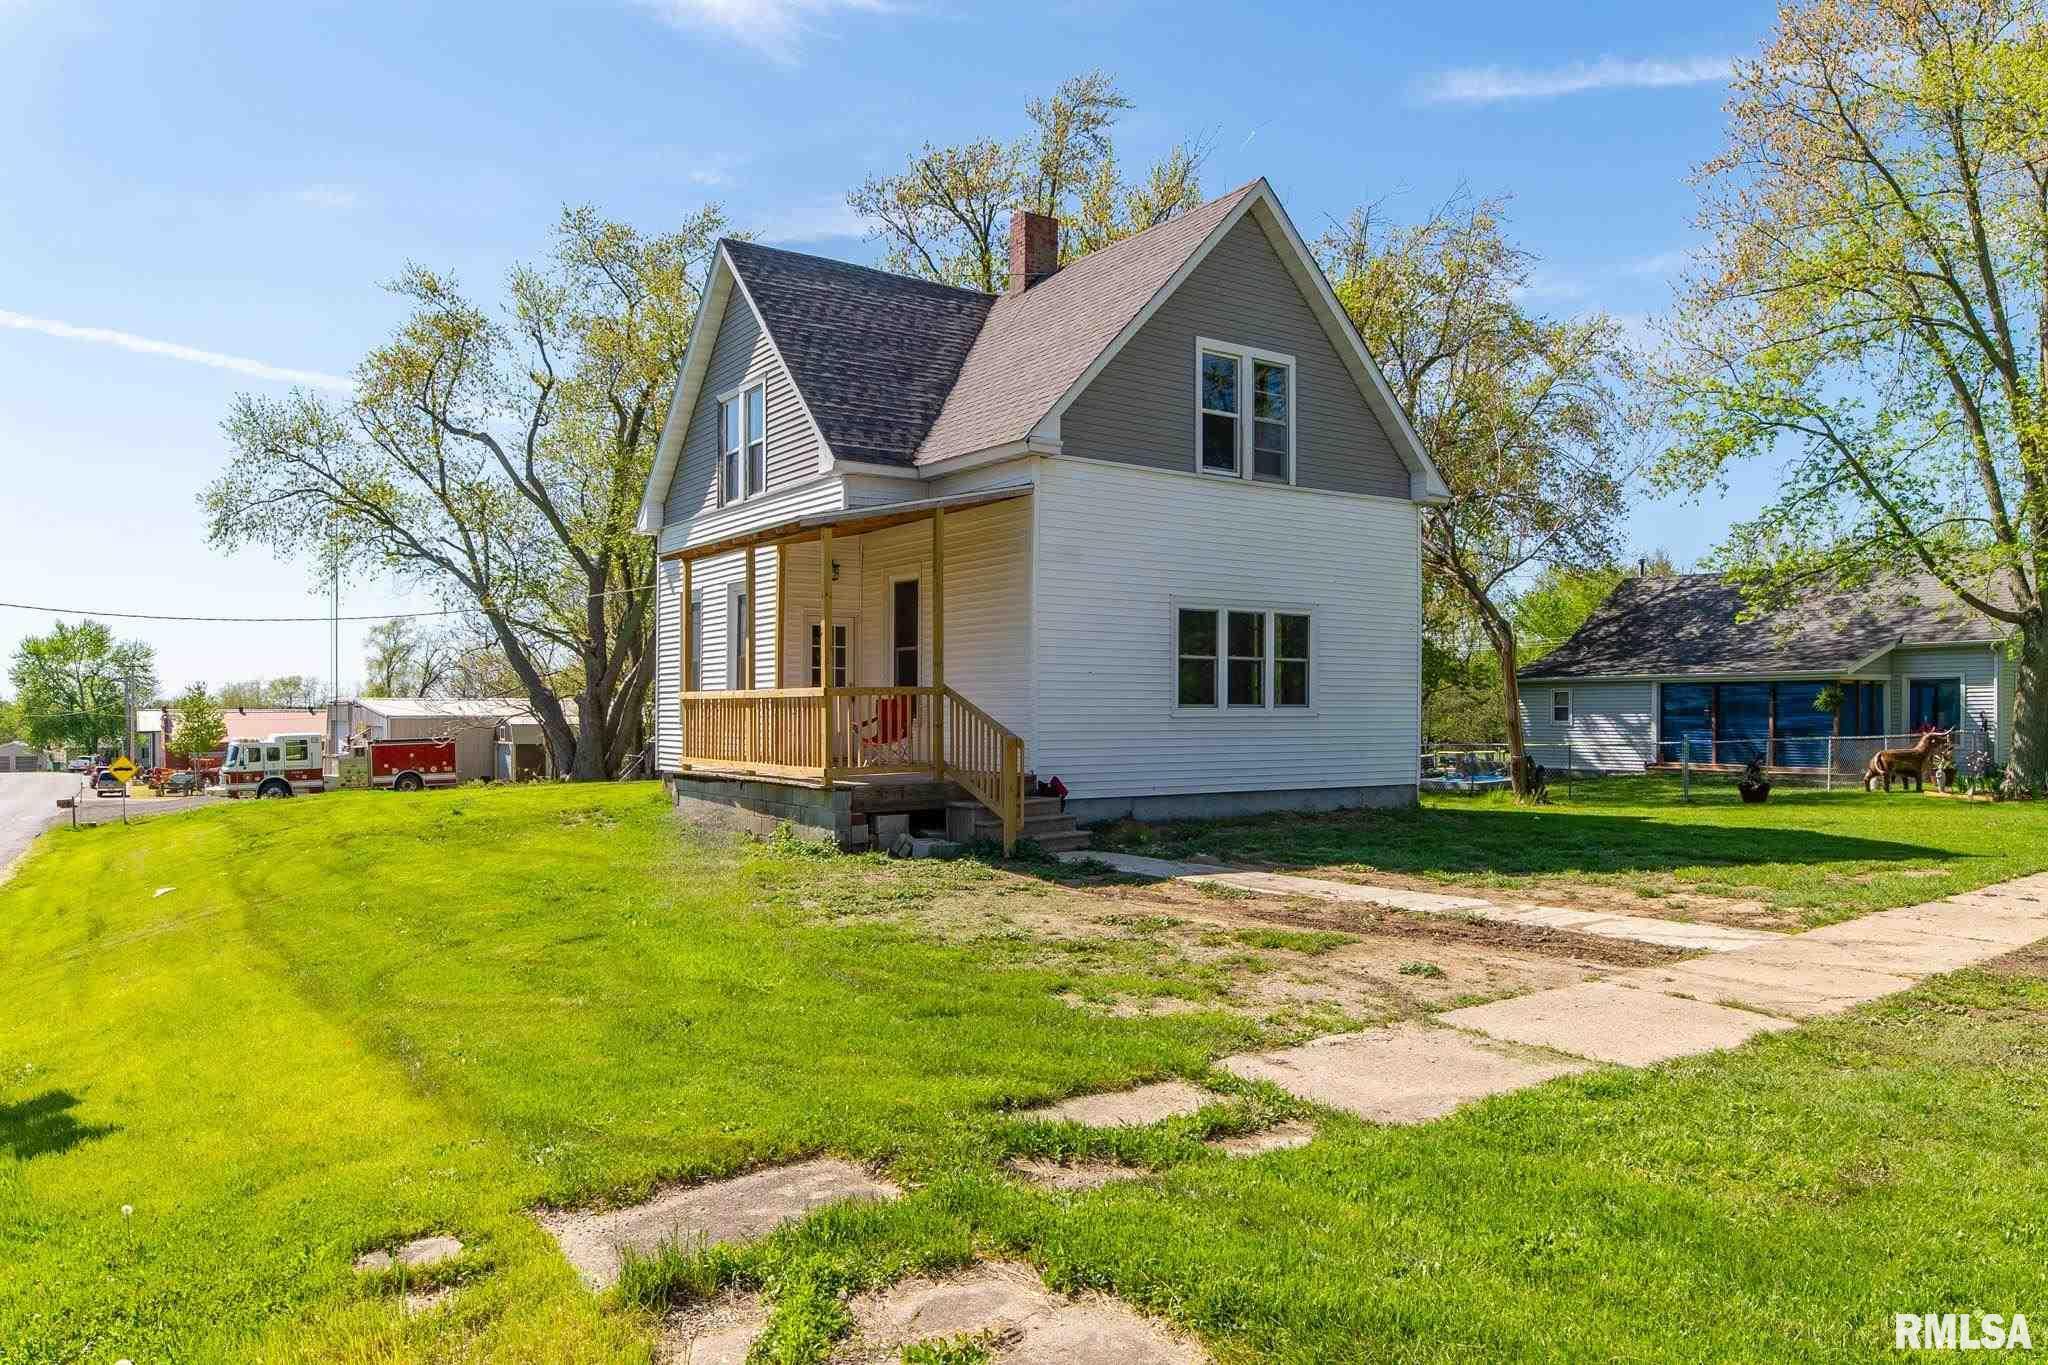 309 S MAIN Property Photo - Waynesville, IL real estate listing